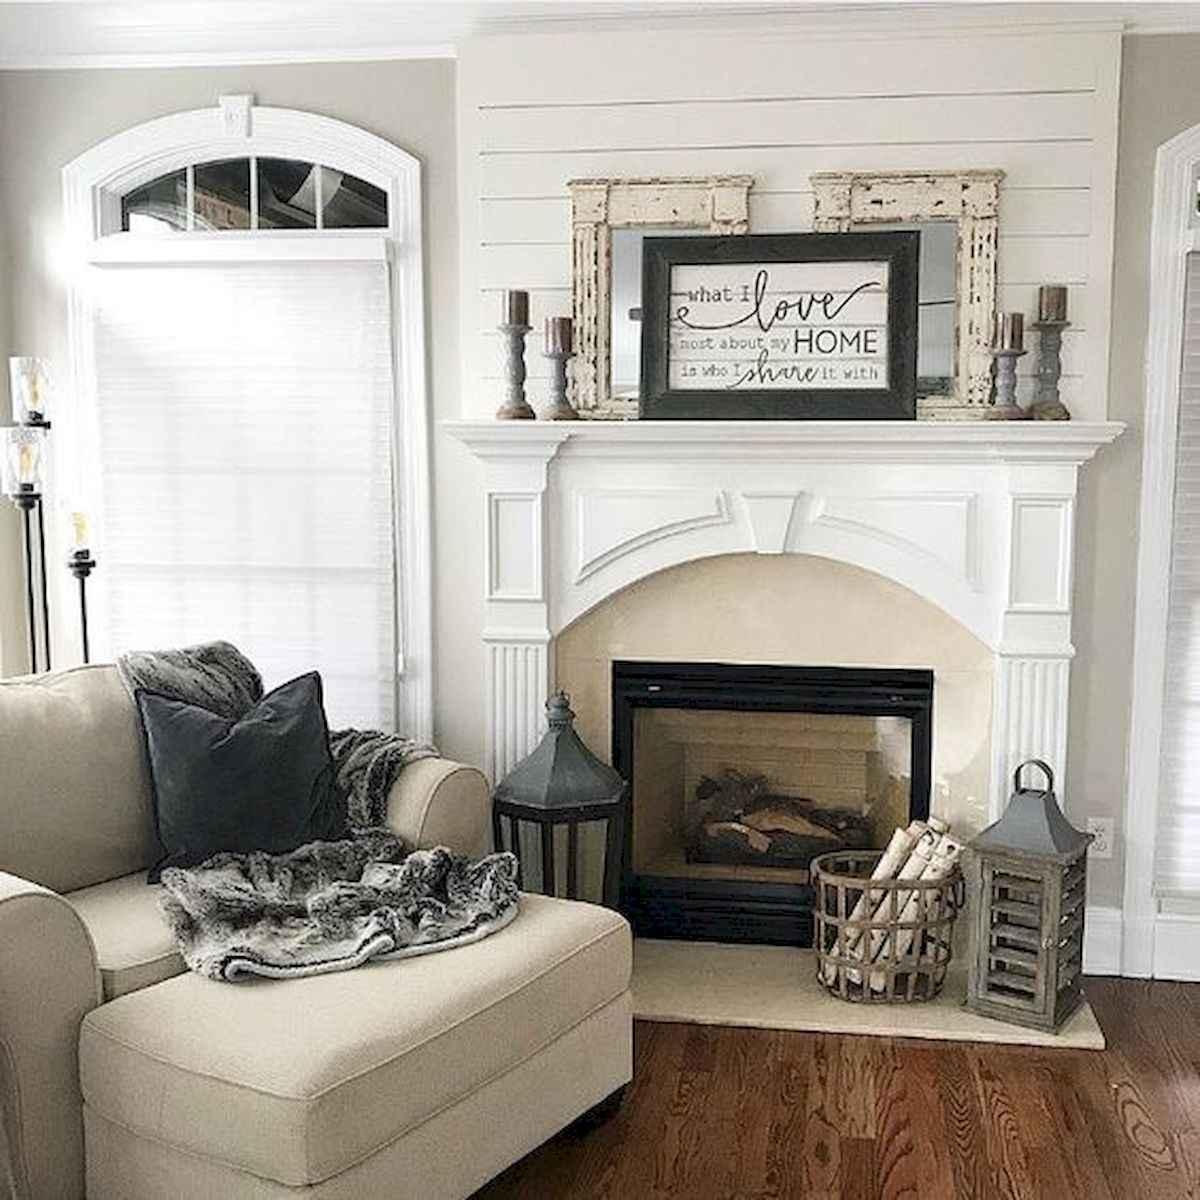 40 Awesome Fireplace Makeover For Farmhouse Home Decor (23)